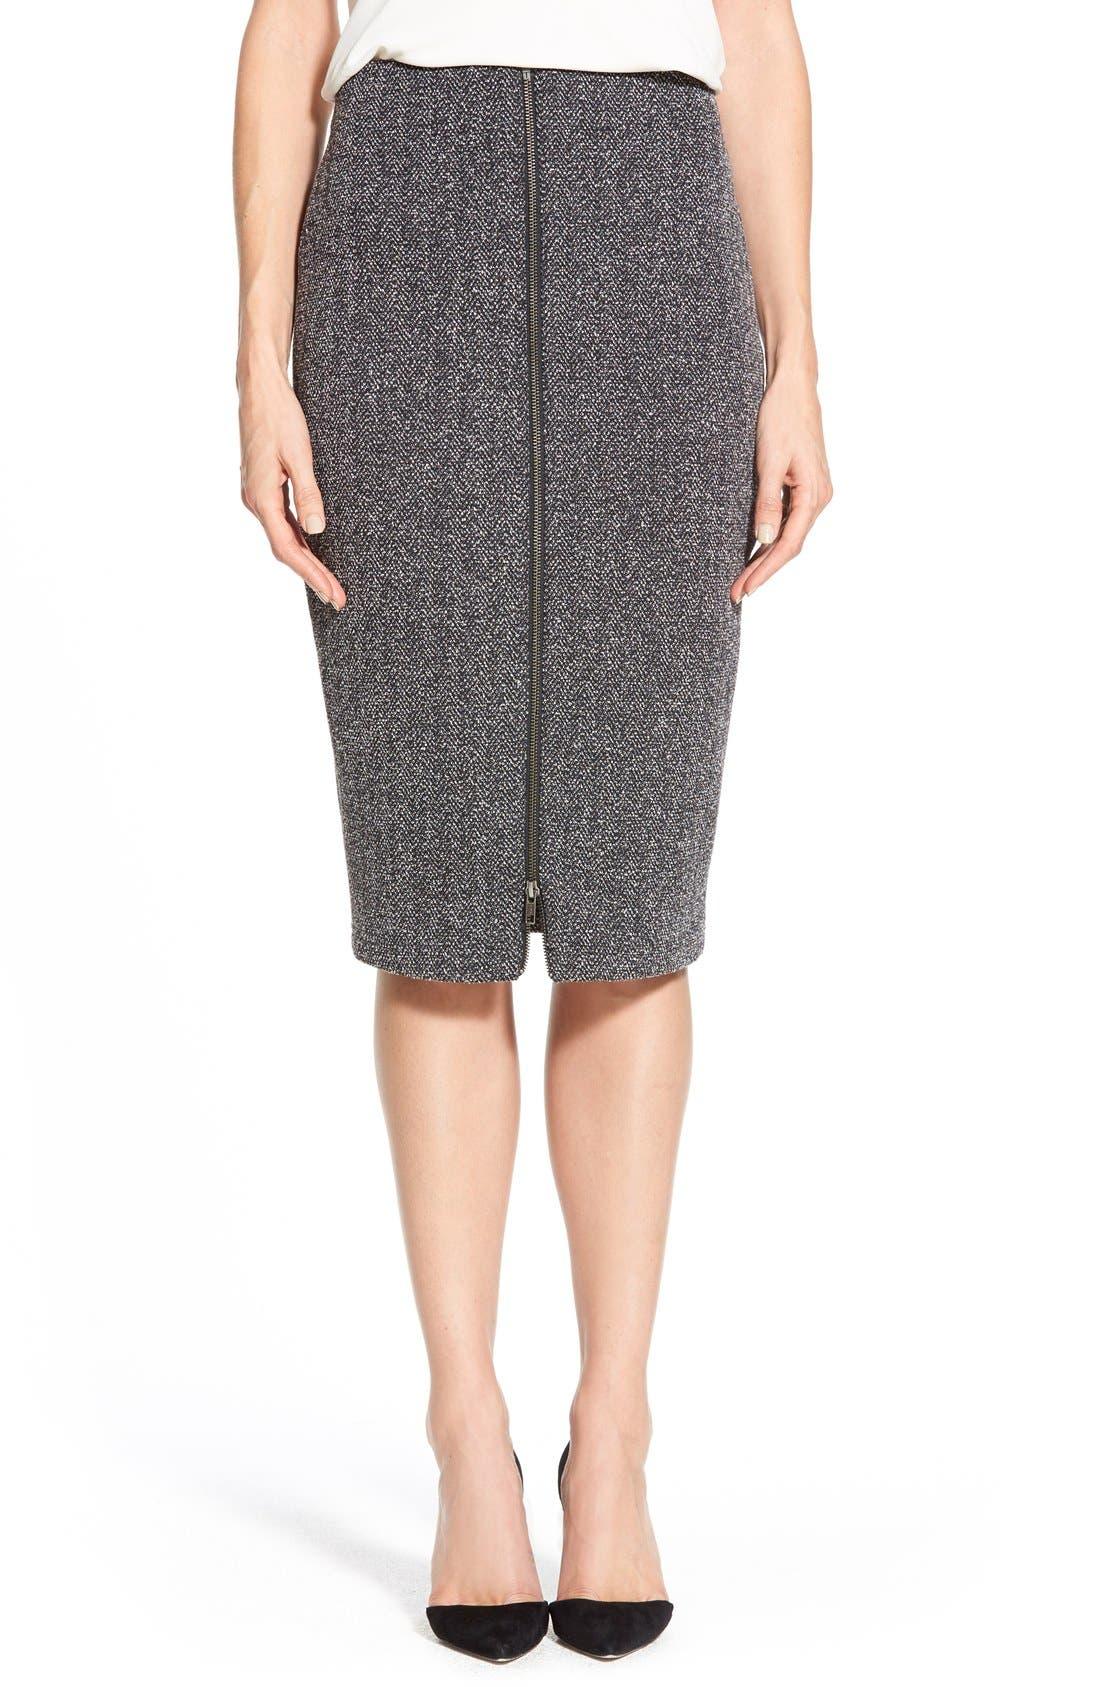 Alternate Image 1 Selected - Halogen® Zip Front Stretch Knit Pencil Skirt (Regular & Petite)